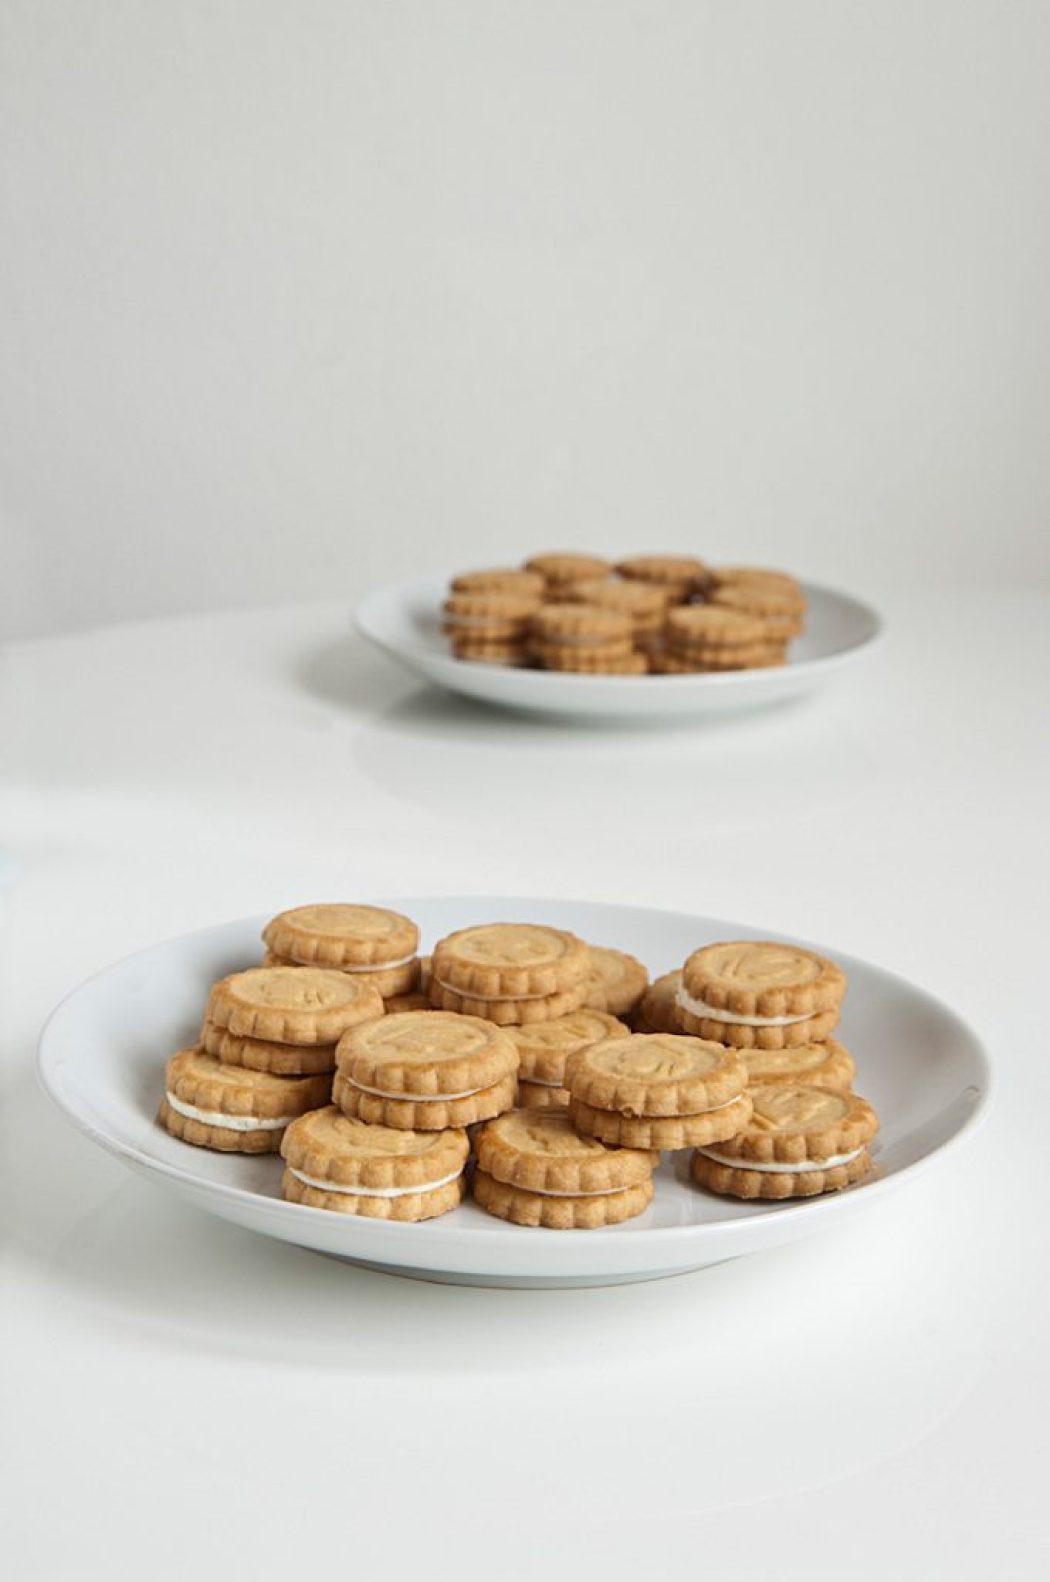 zauberspruch kekse ausstechen